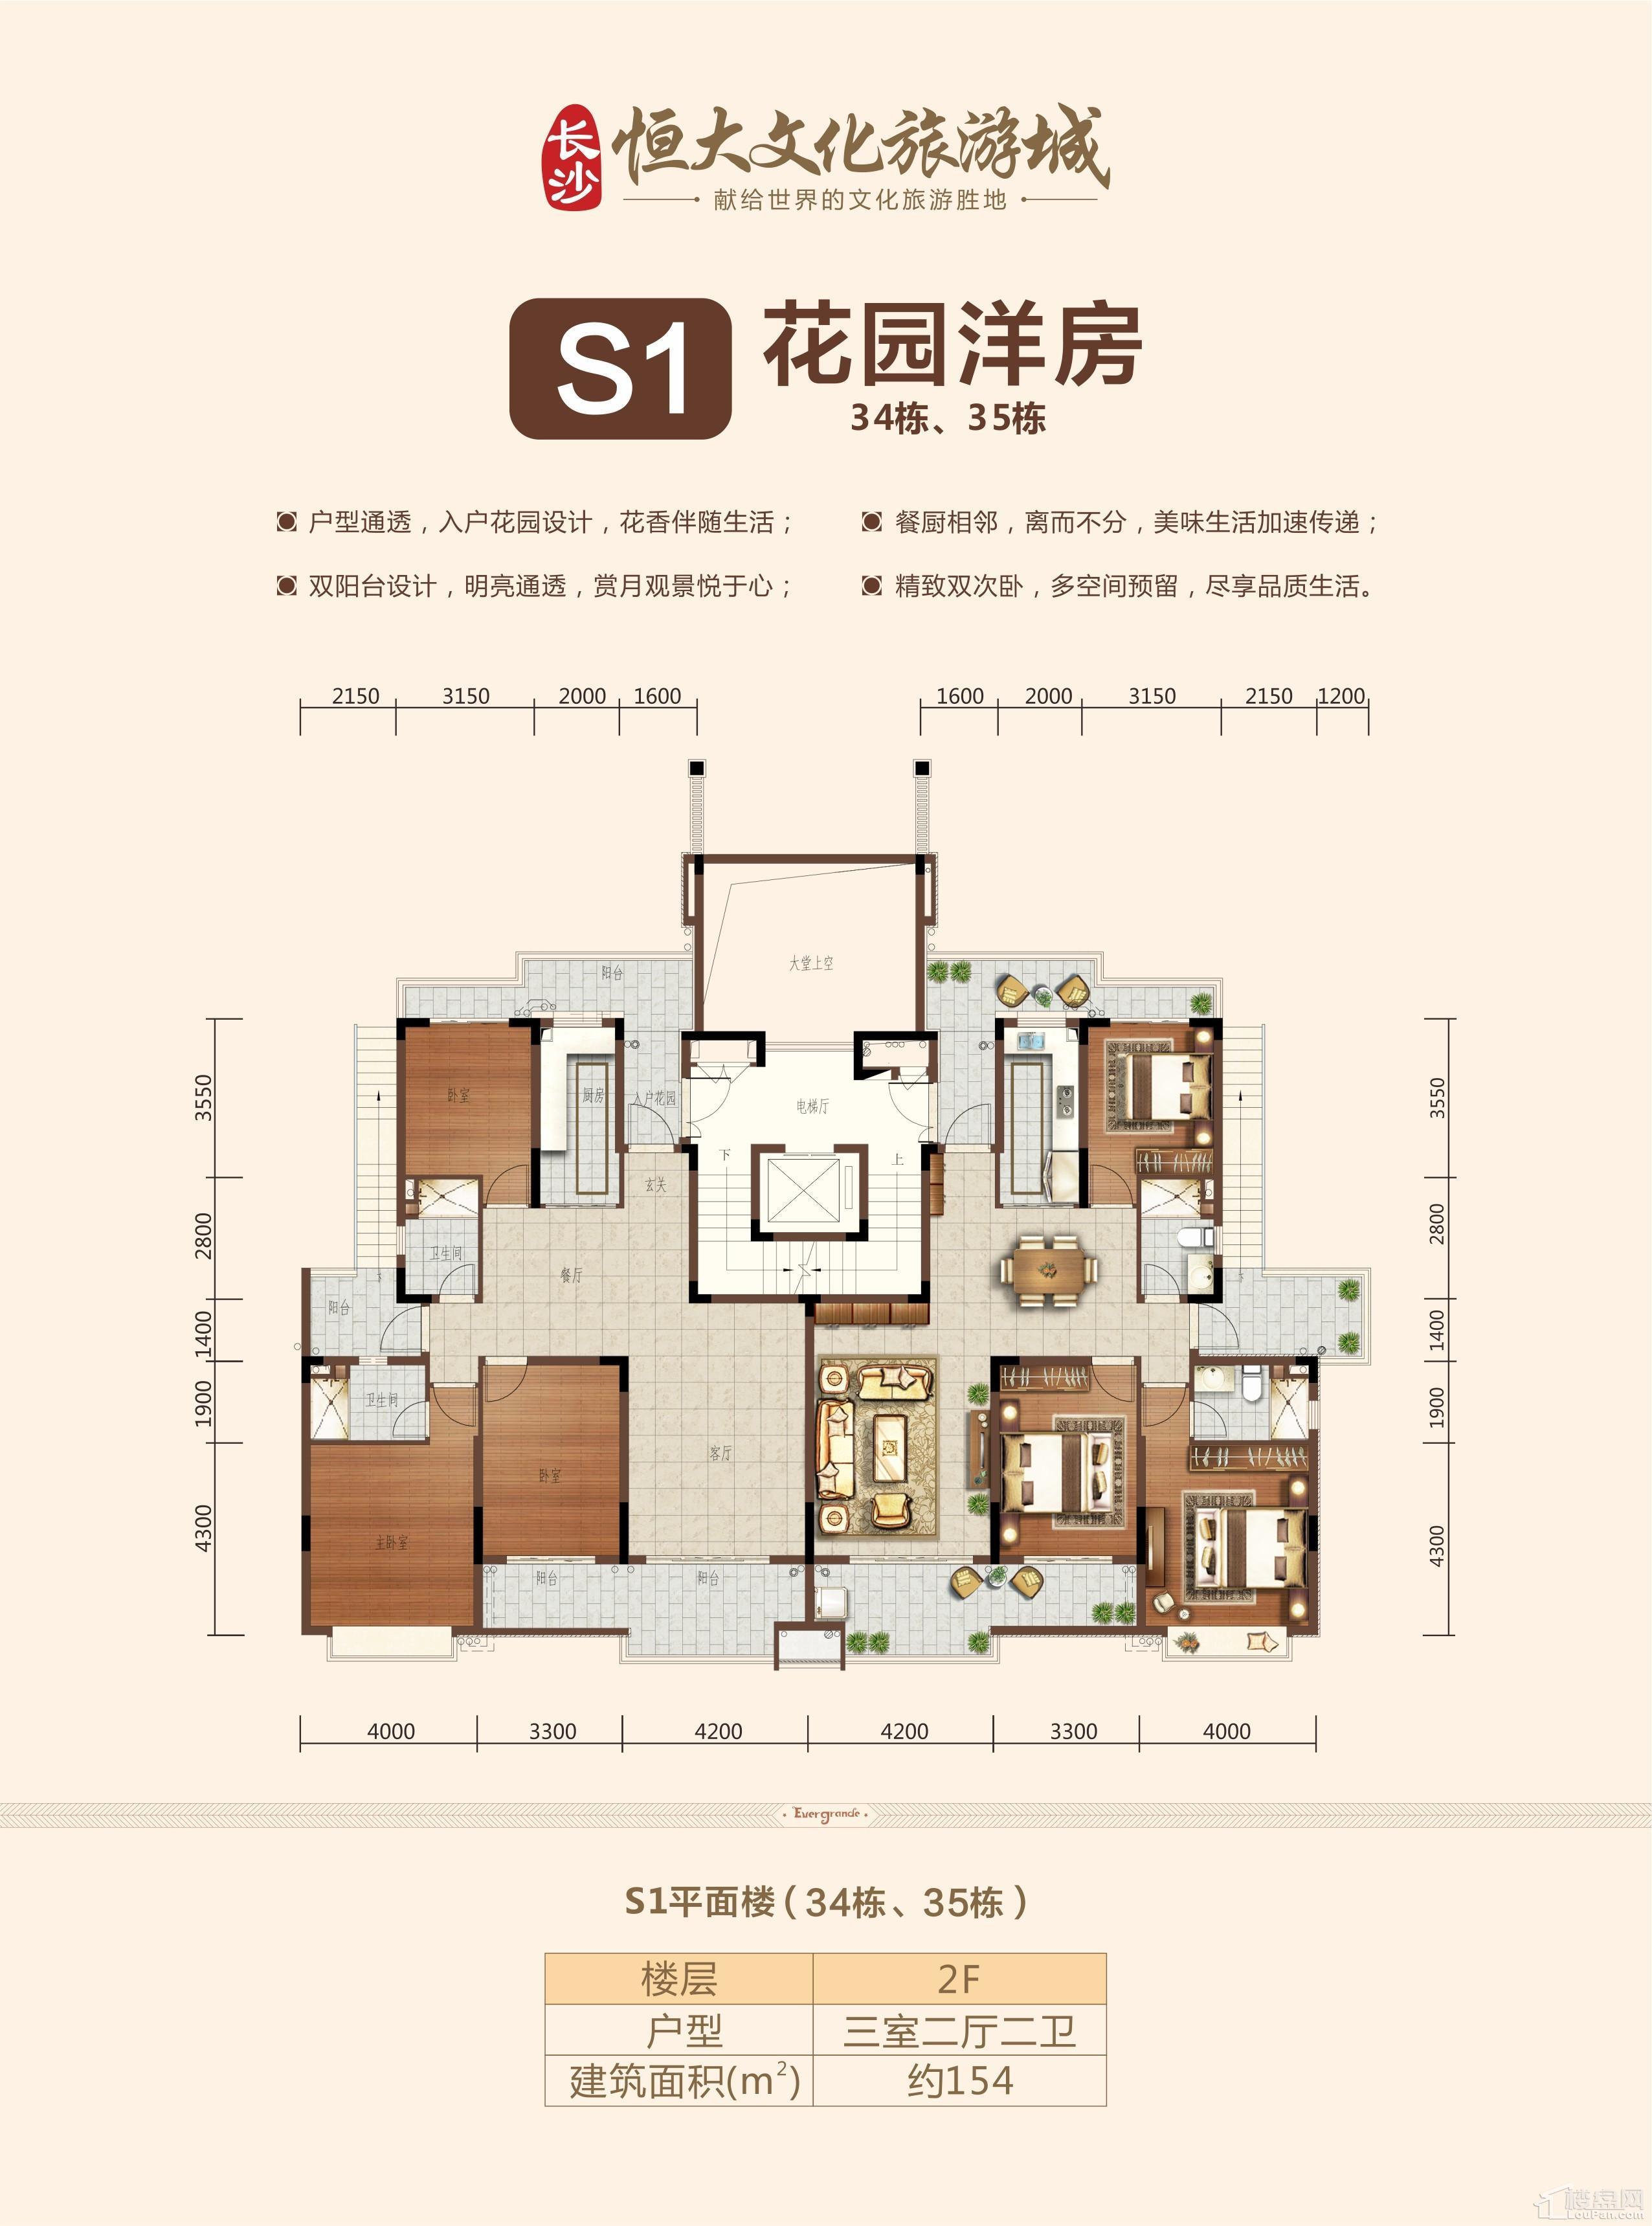 S1花园洋房二层